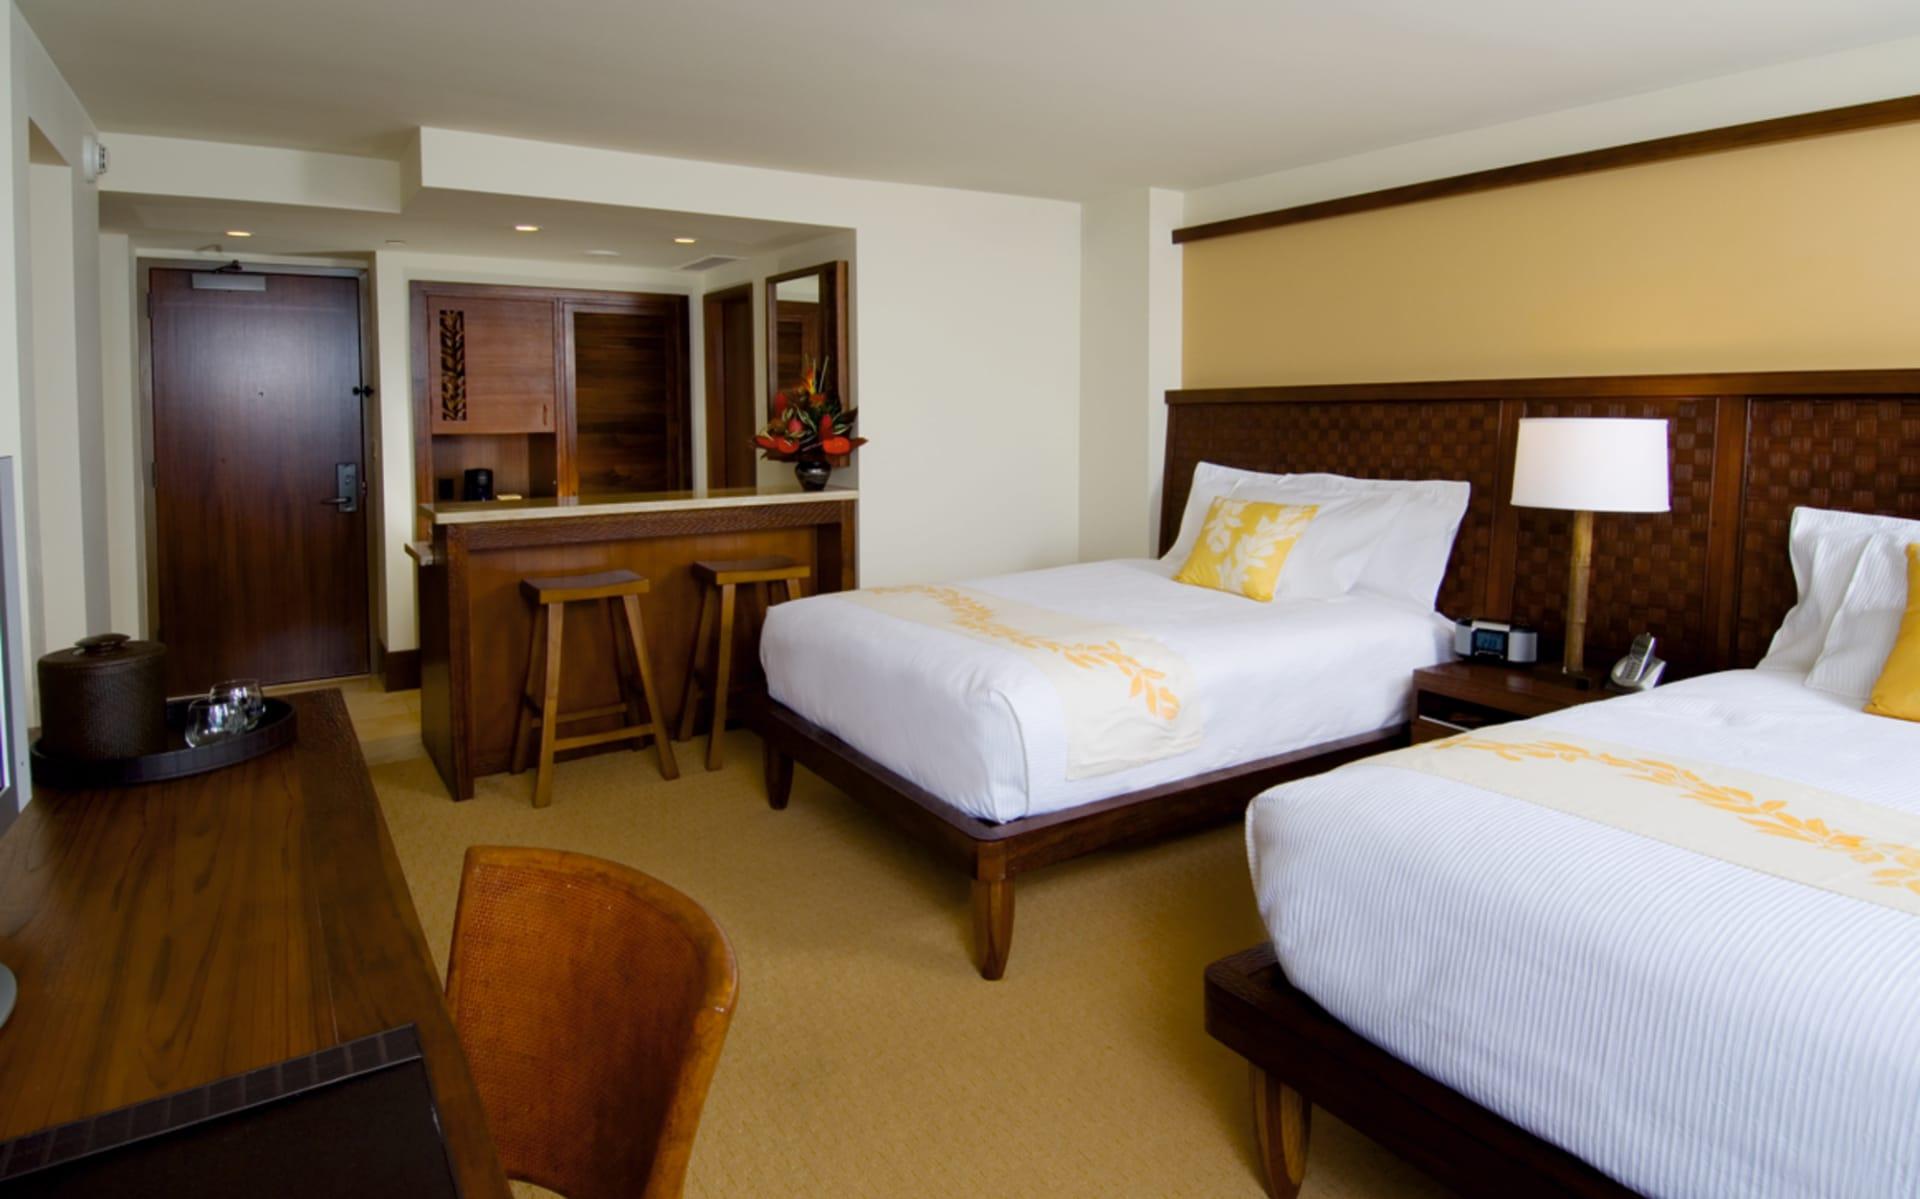 Royal Lahaina Resort in Lahaina - Maui: zimmer royal lahaina resort twinbed zimmer